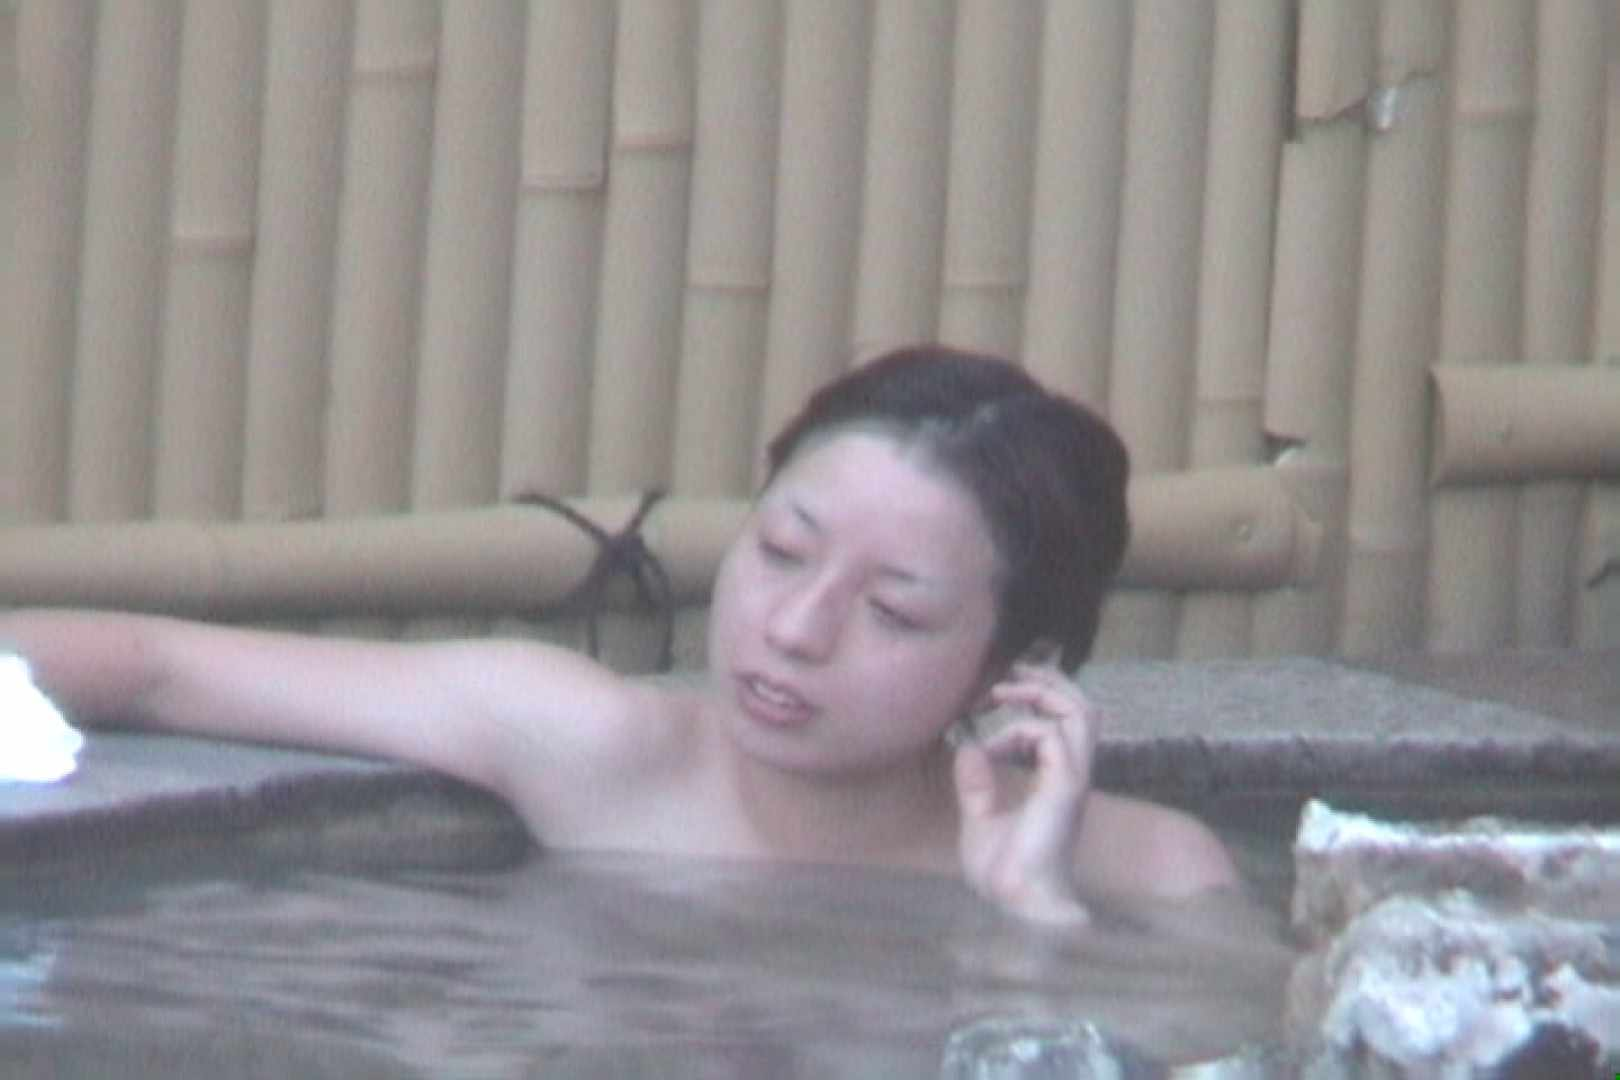 Aquaな露天風呂Vol.608 盗撮 戯れ無修正画像 69連発 50